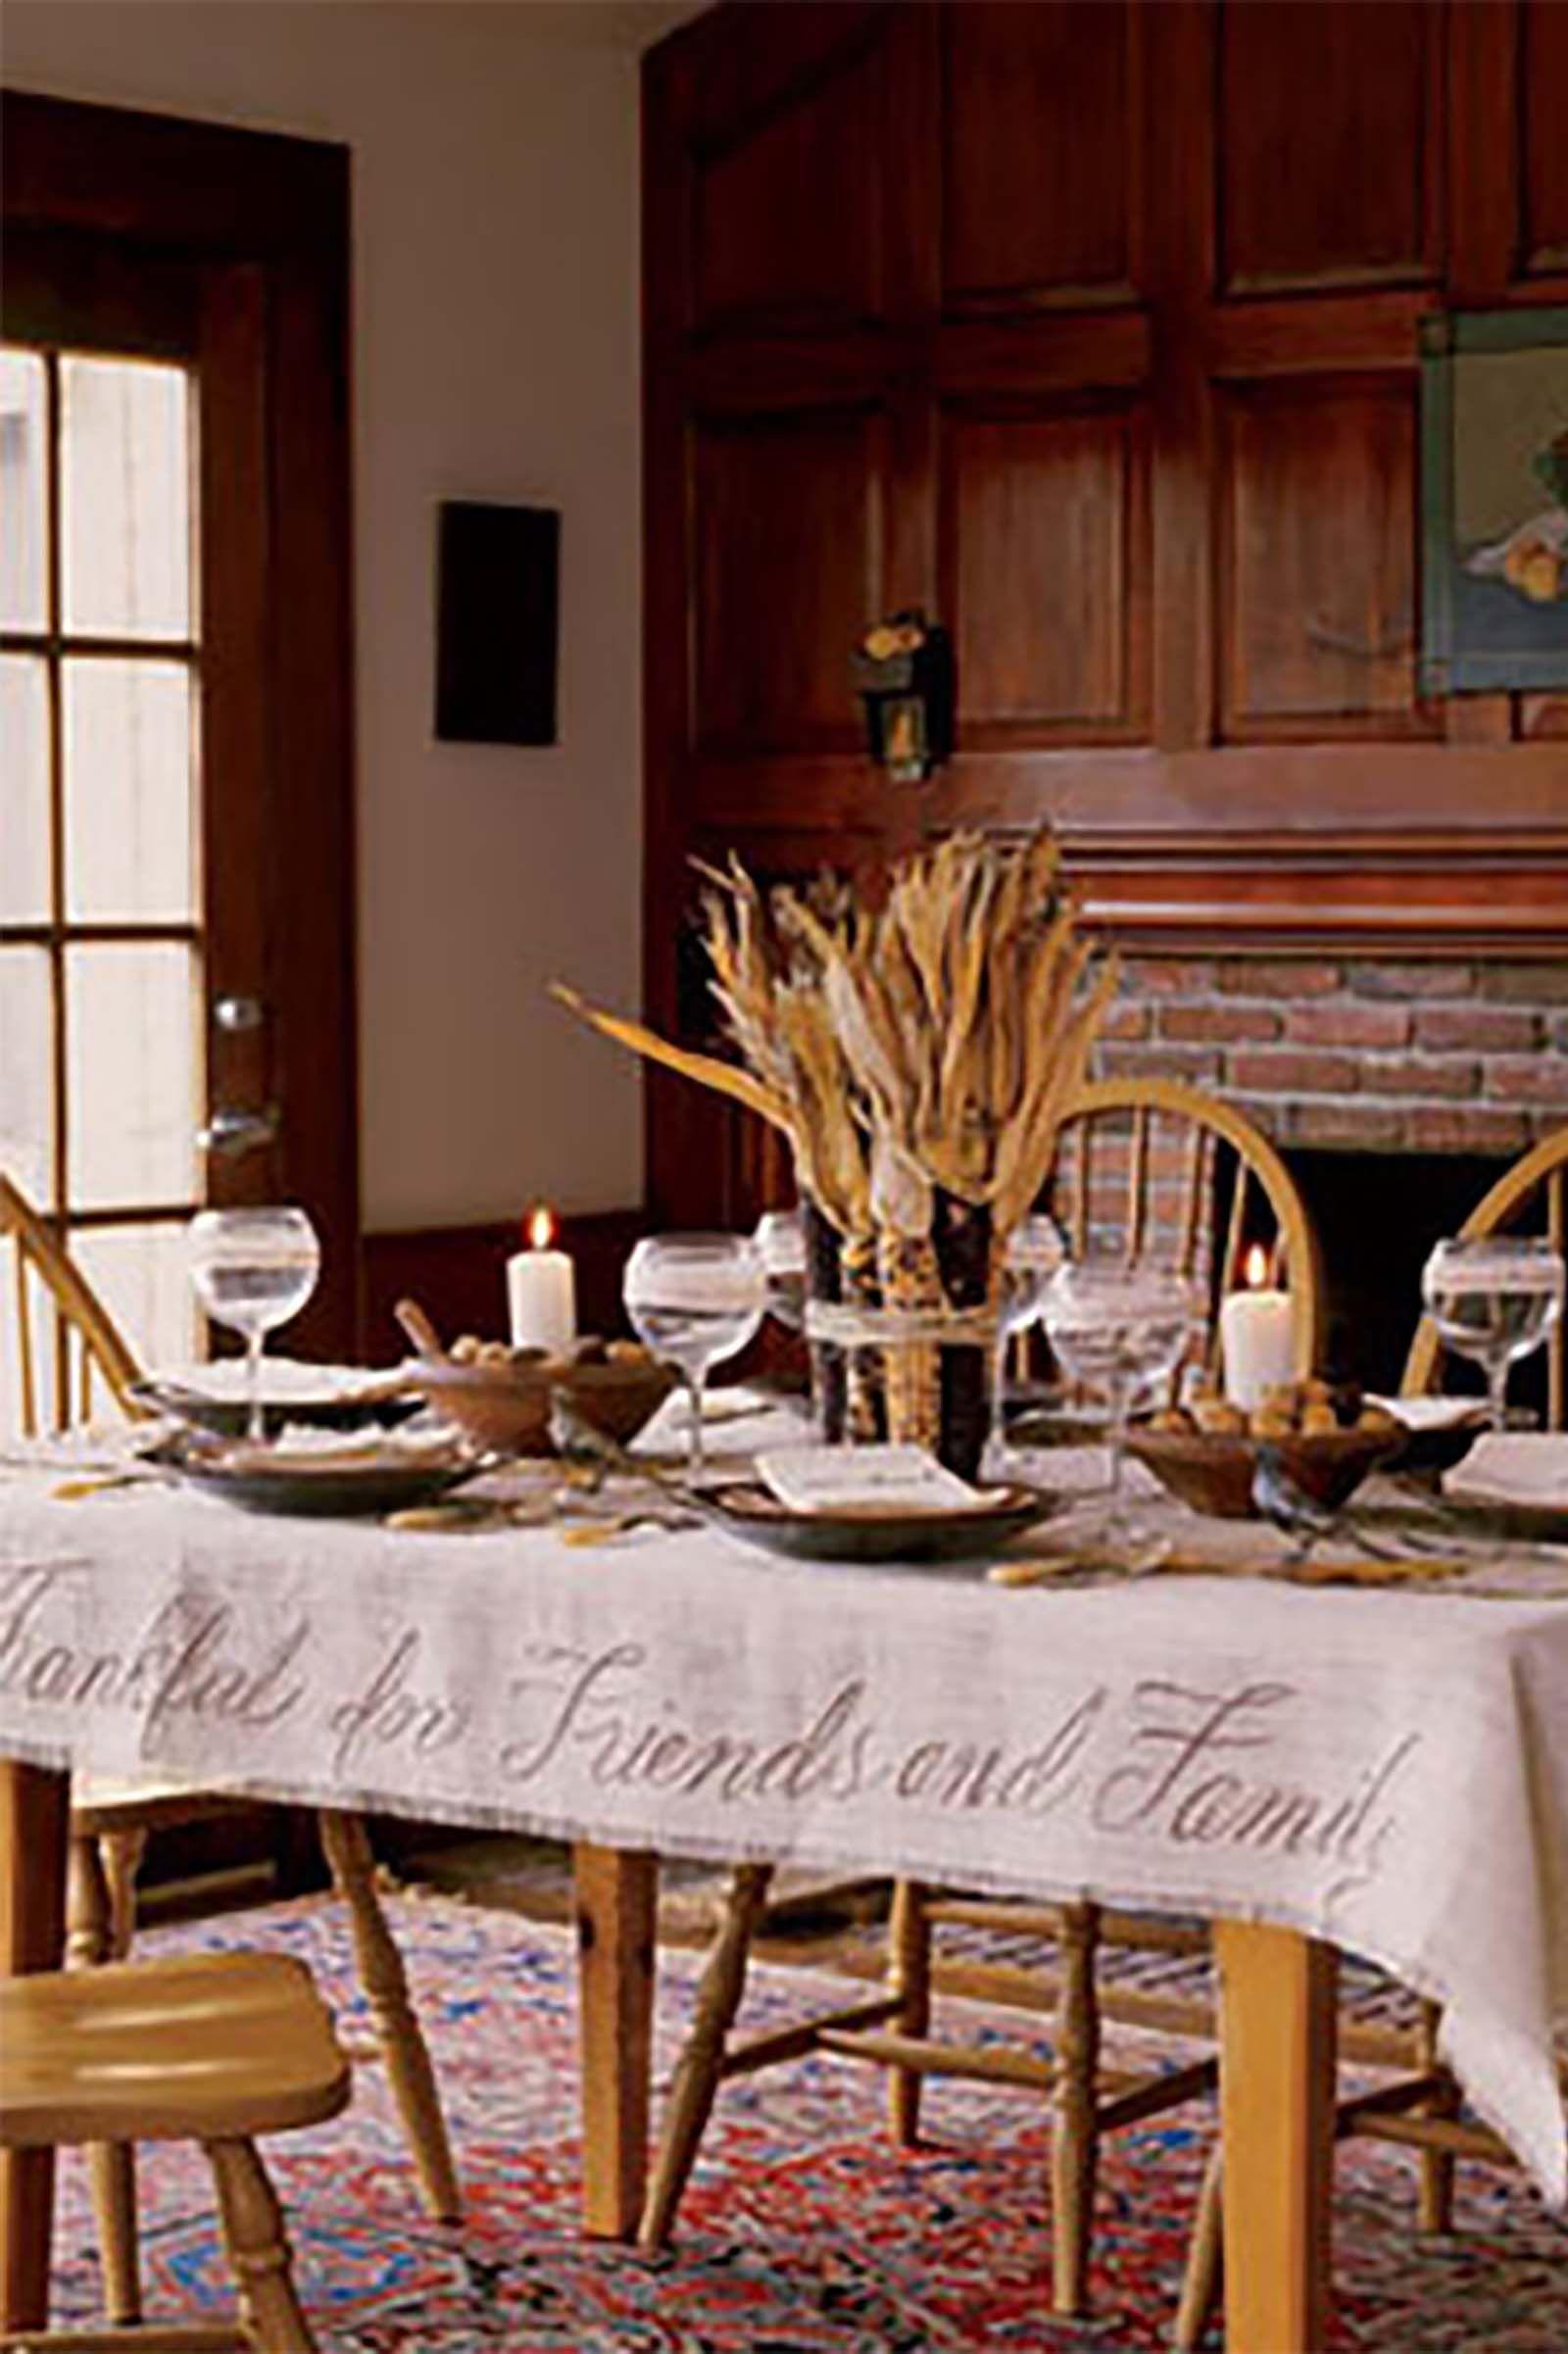 40 Easy DIY Thanksgiving Decorations - Best Ideas for Thanksgiving Decorating & 40 Easy DIY Thanksgiving Decorations - Best Ideas for Thanksgiving ...